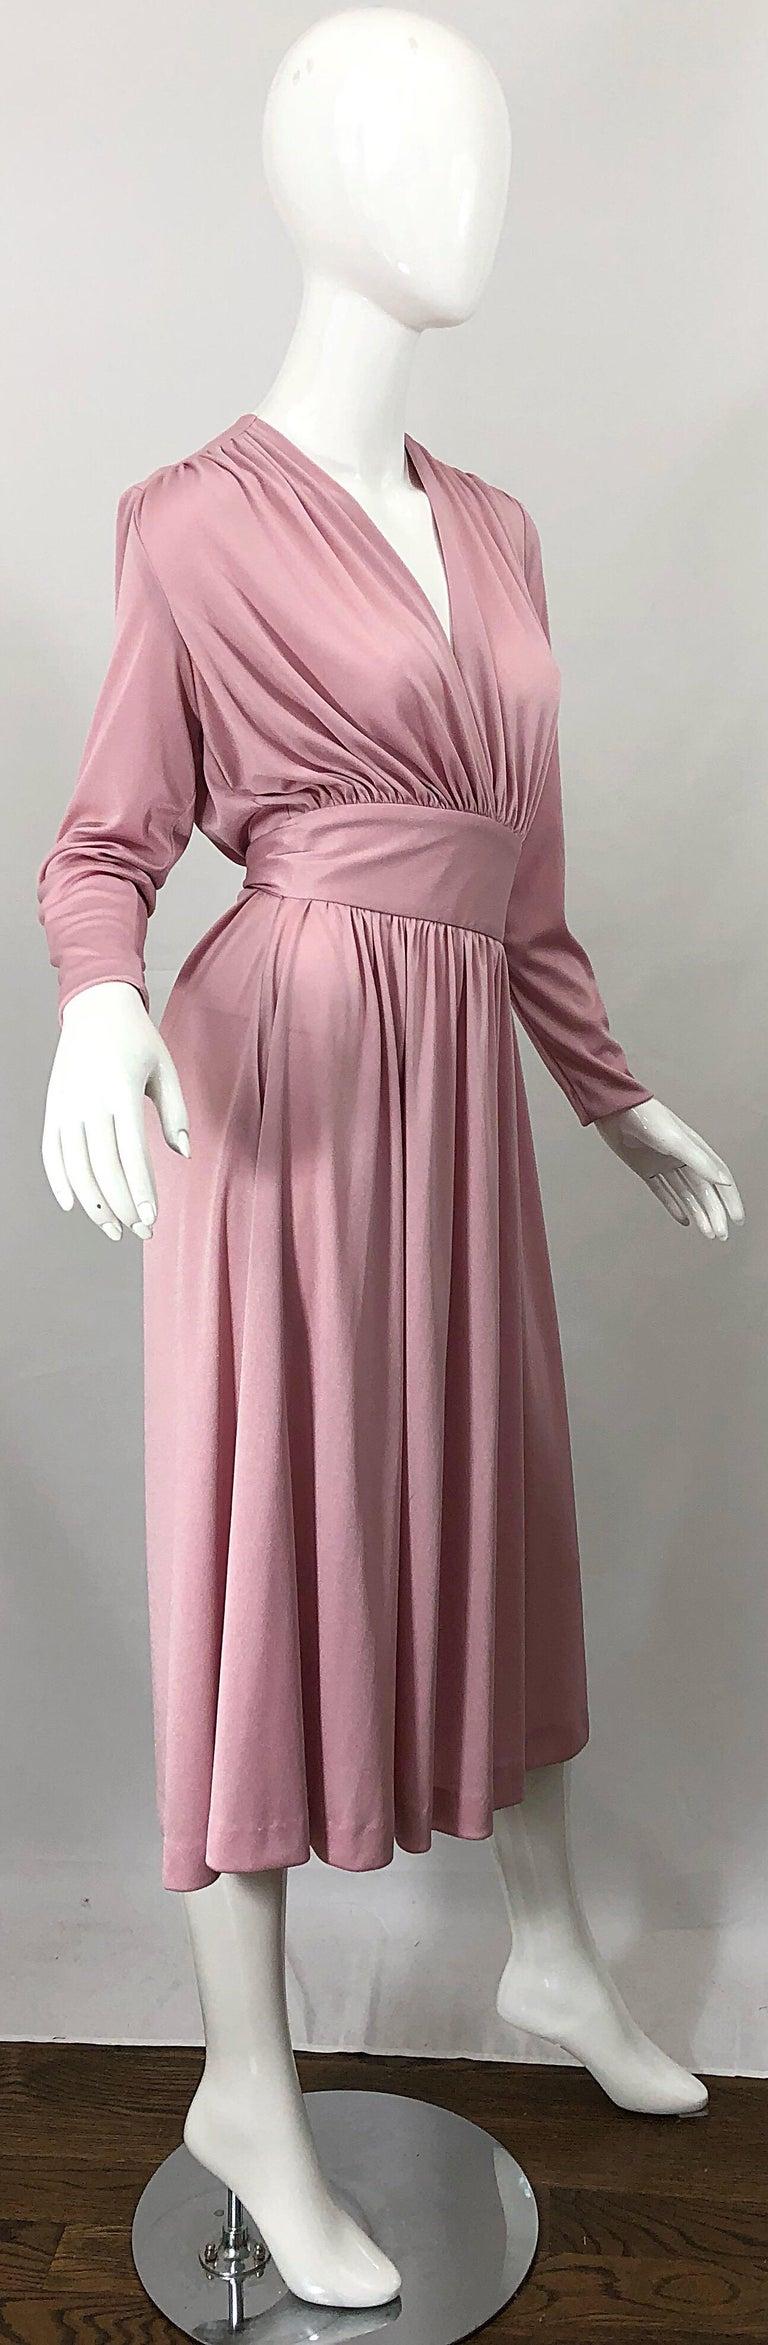 Joy Stevens 1970s Pink Mauve Dusty Rose Long Sleeve Disco Vintage 70s Dress For Sale 4